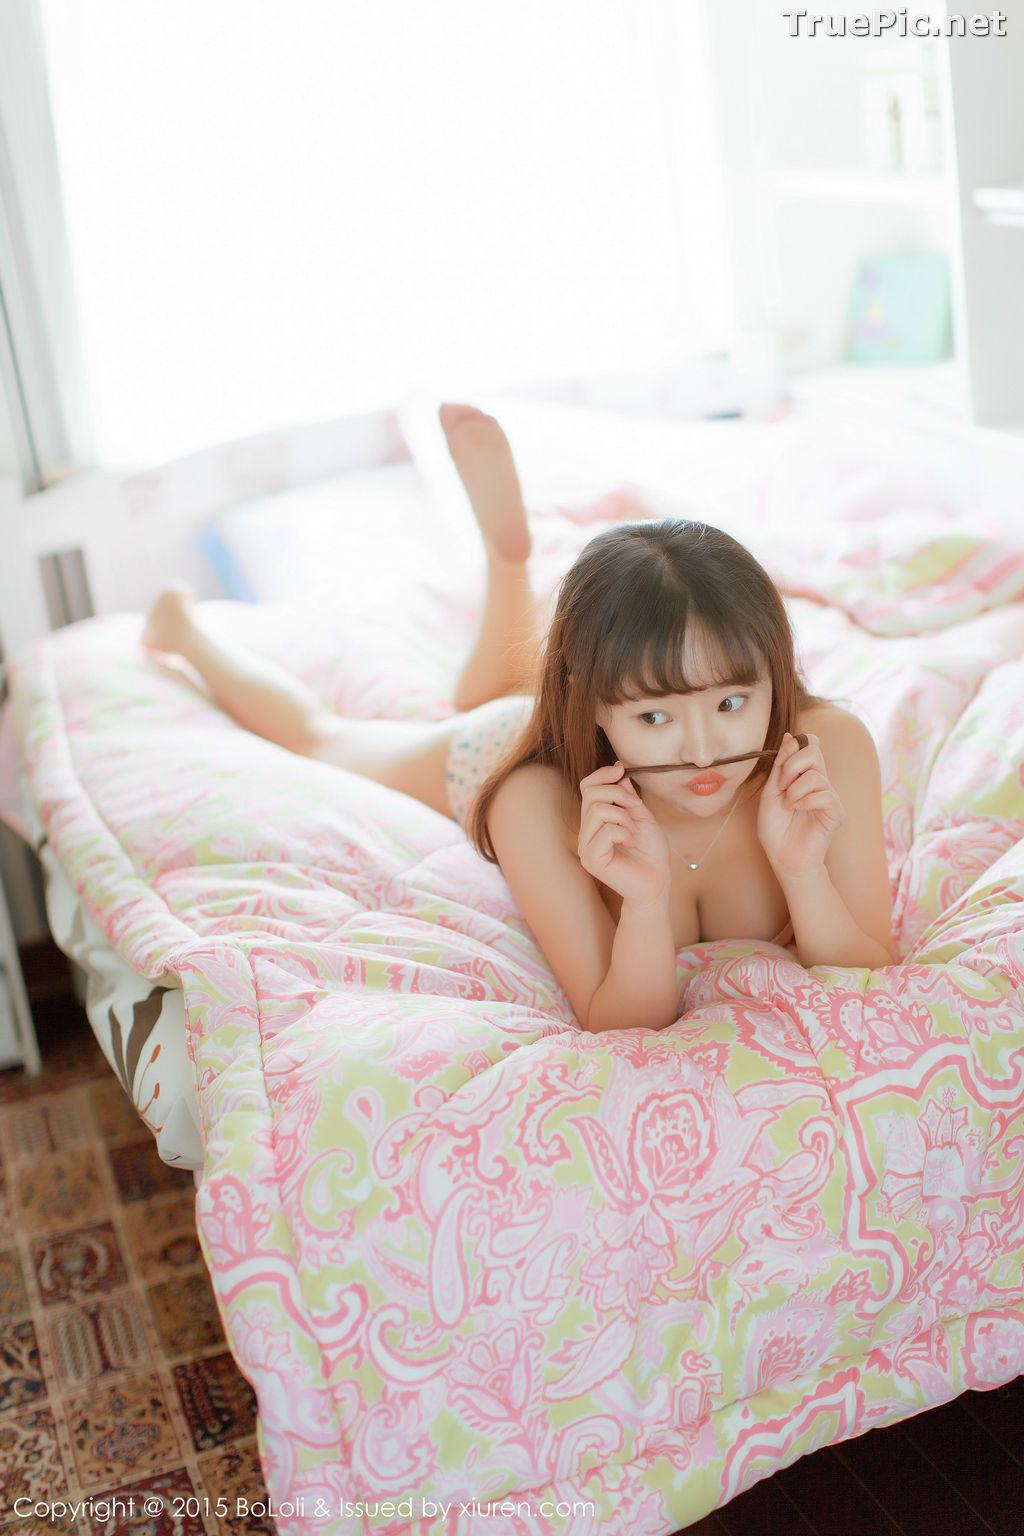 Image BoLoli Vol.002 - Chinese Cute Model - Liu You Qi Sevenbaby (柳侑绮Sevenbaby) - TruePic.net - Picture-7